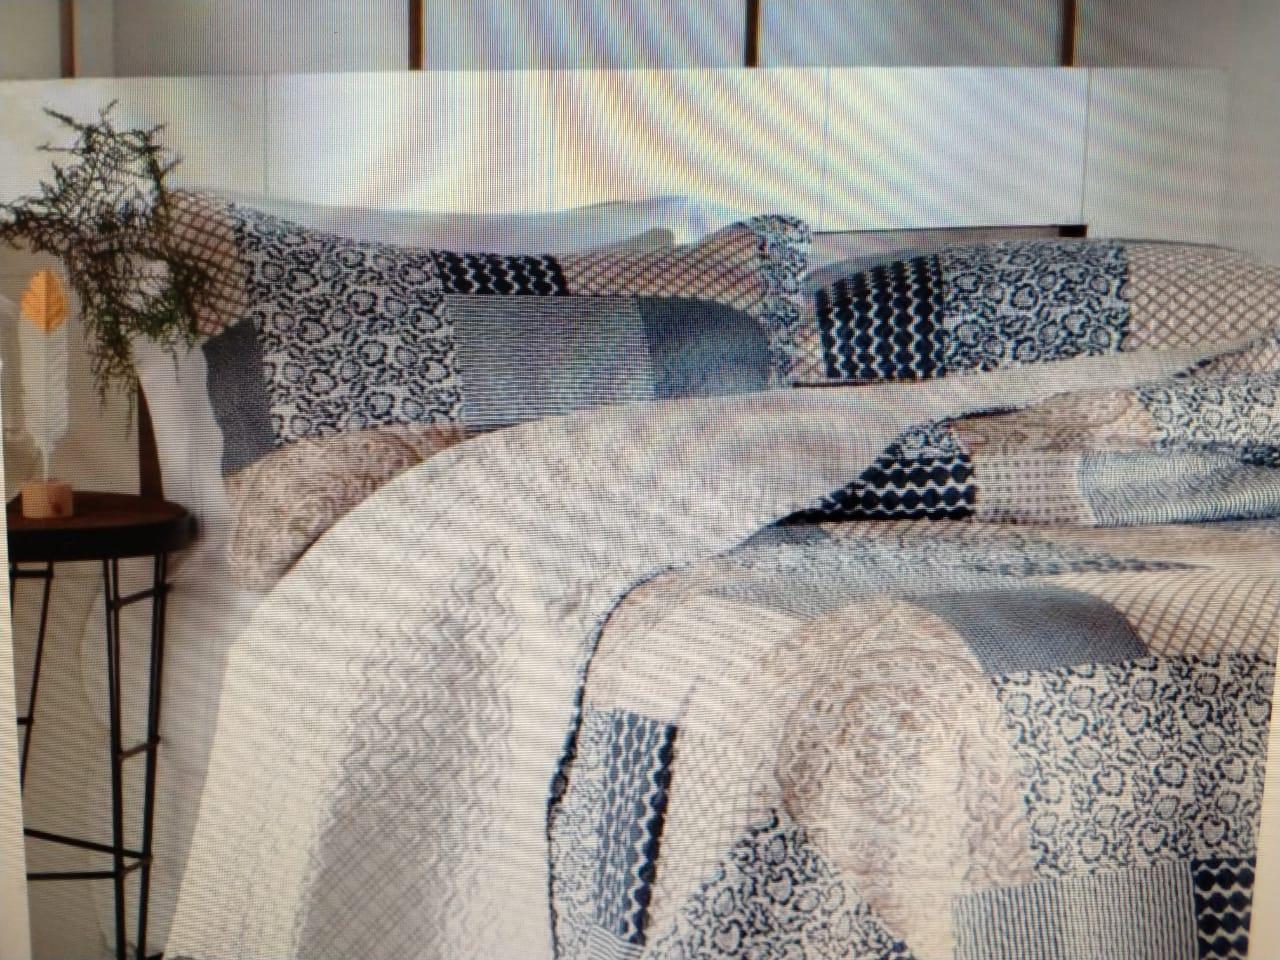 Kit colcha Bouti Patcwork Queen com Porta Travesseiro Sevilha